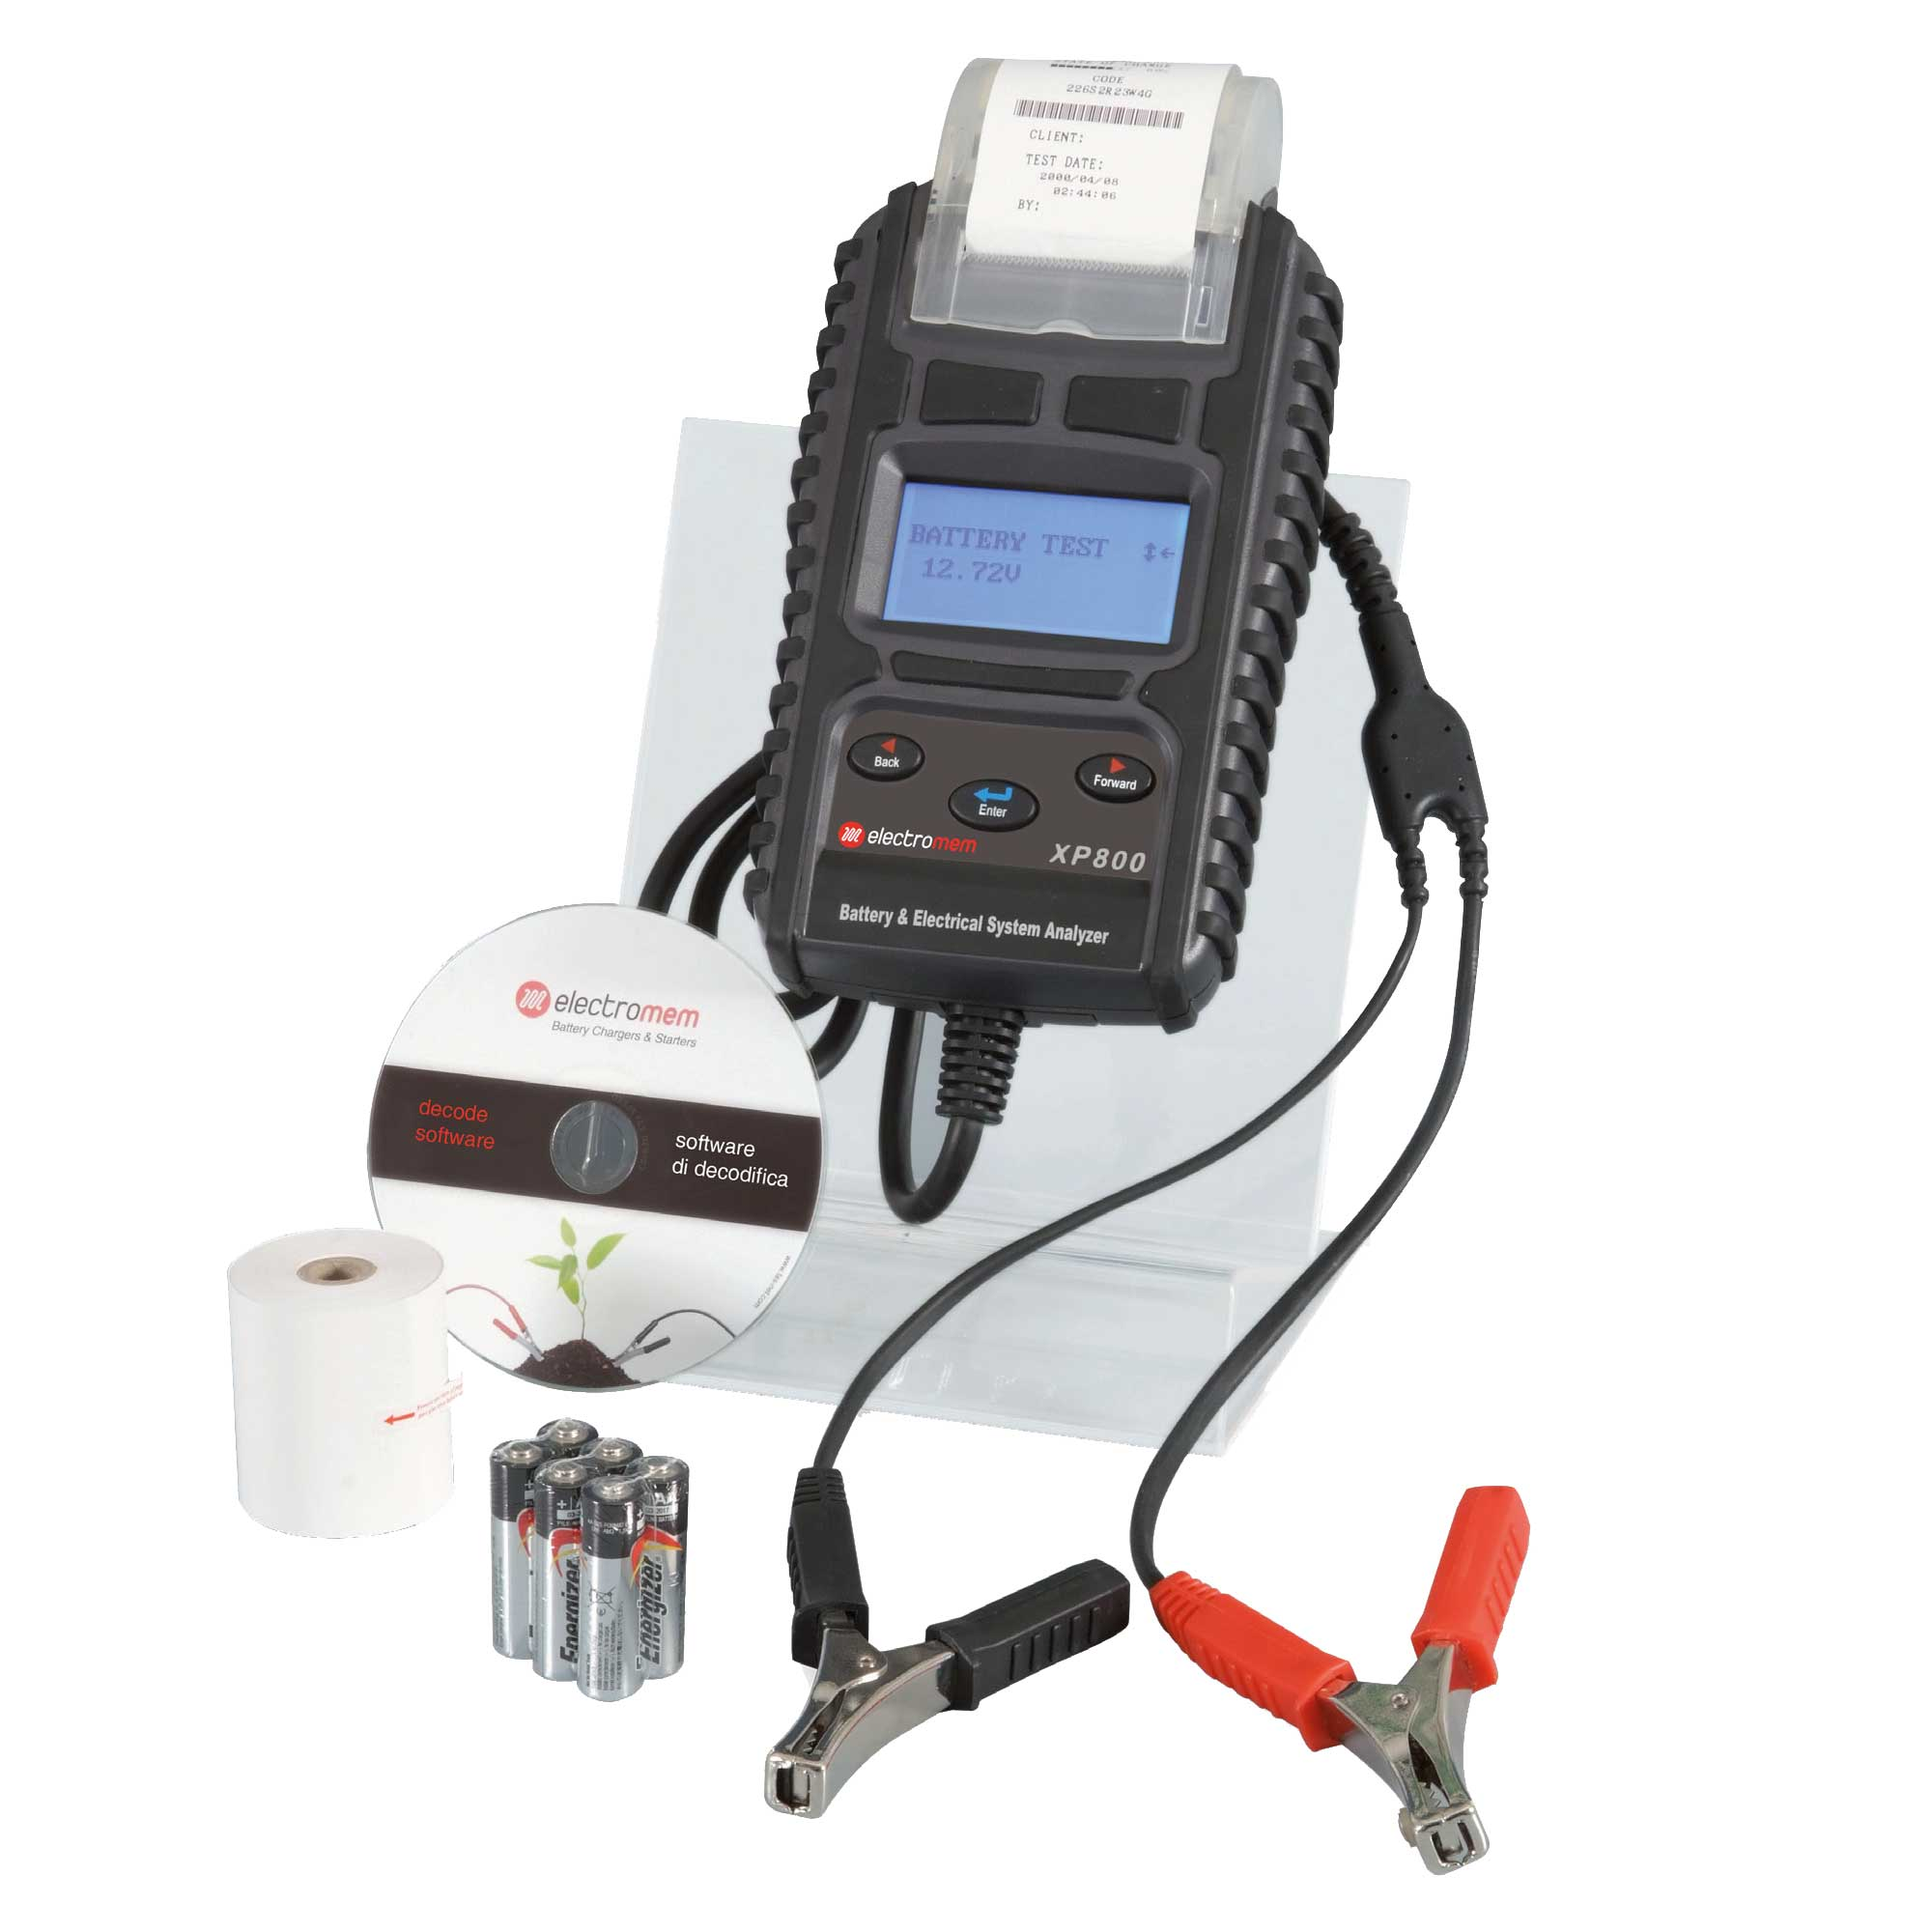 Batterietester, digital, mit Druckfunktion